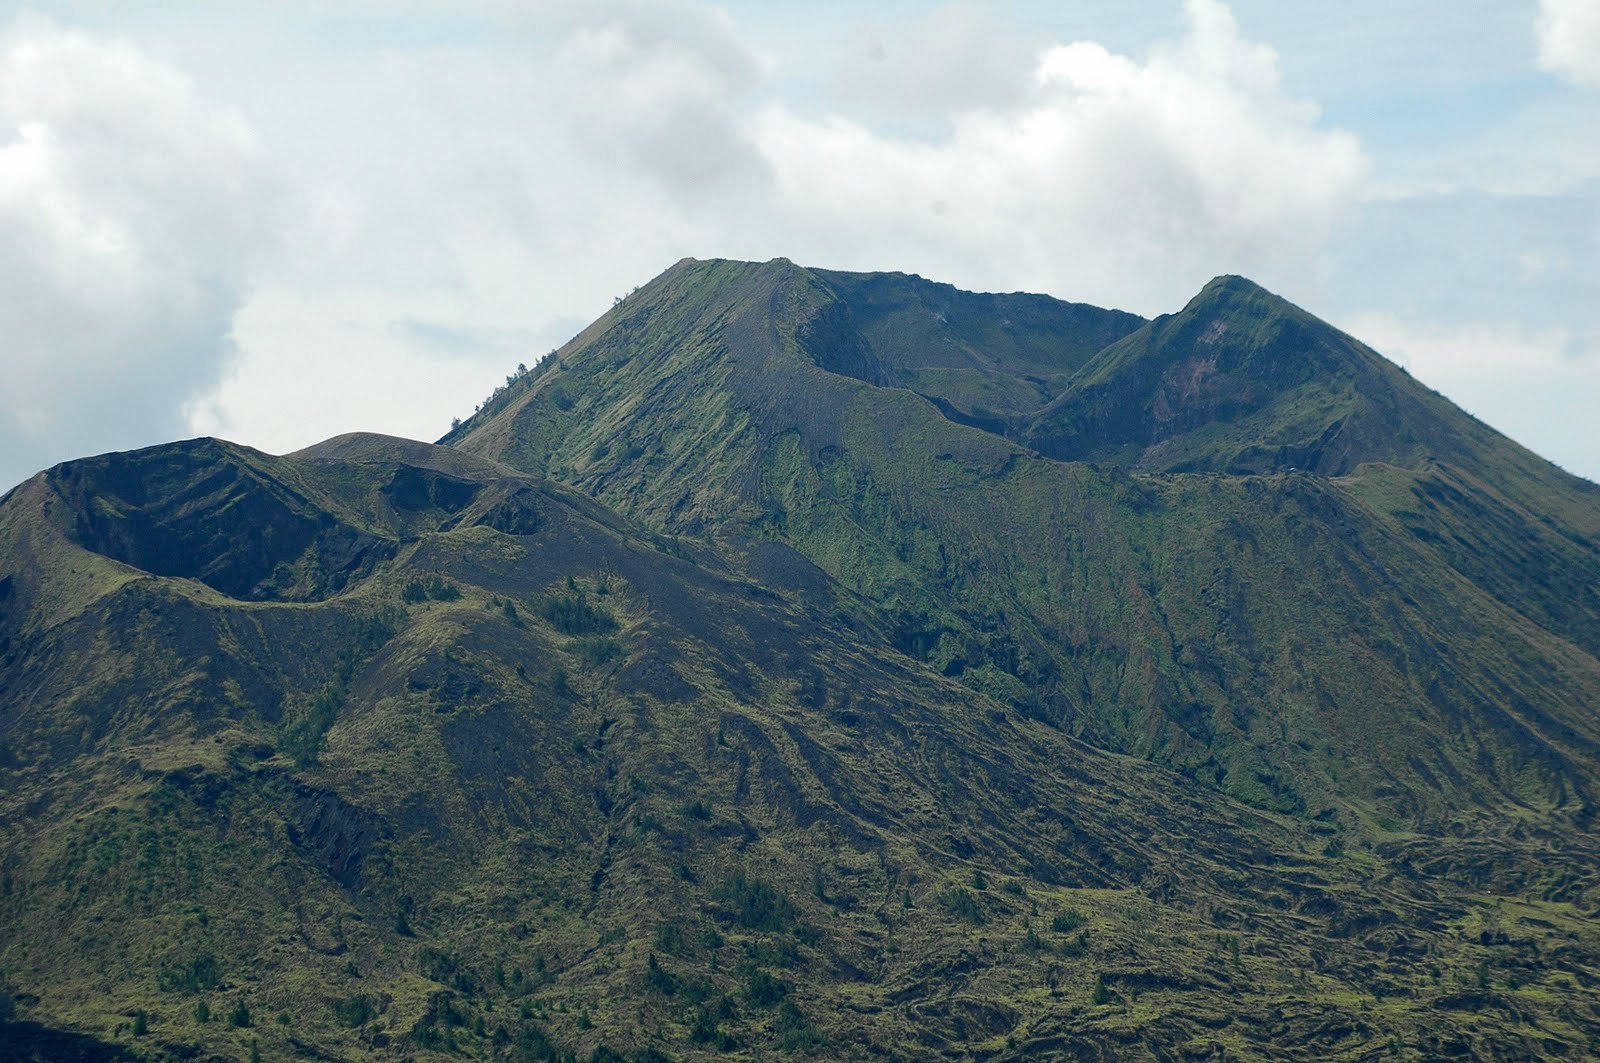 bali volcano - photo #10